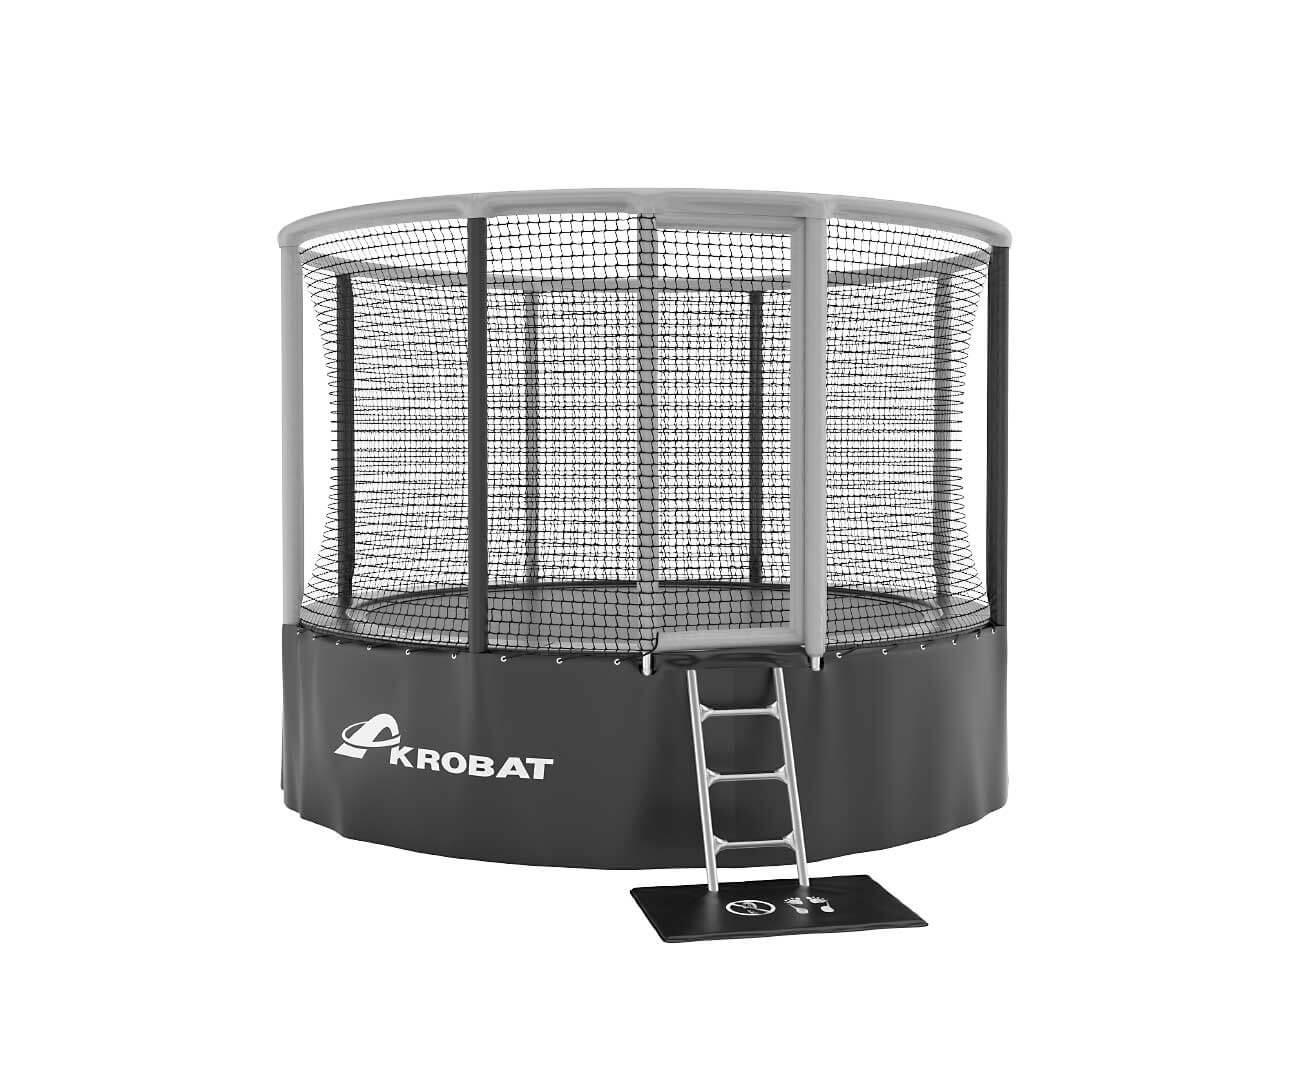 Akrobat Gallus 10 Grey-black enclosure /Black safety pad/ Grey jumping mat